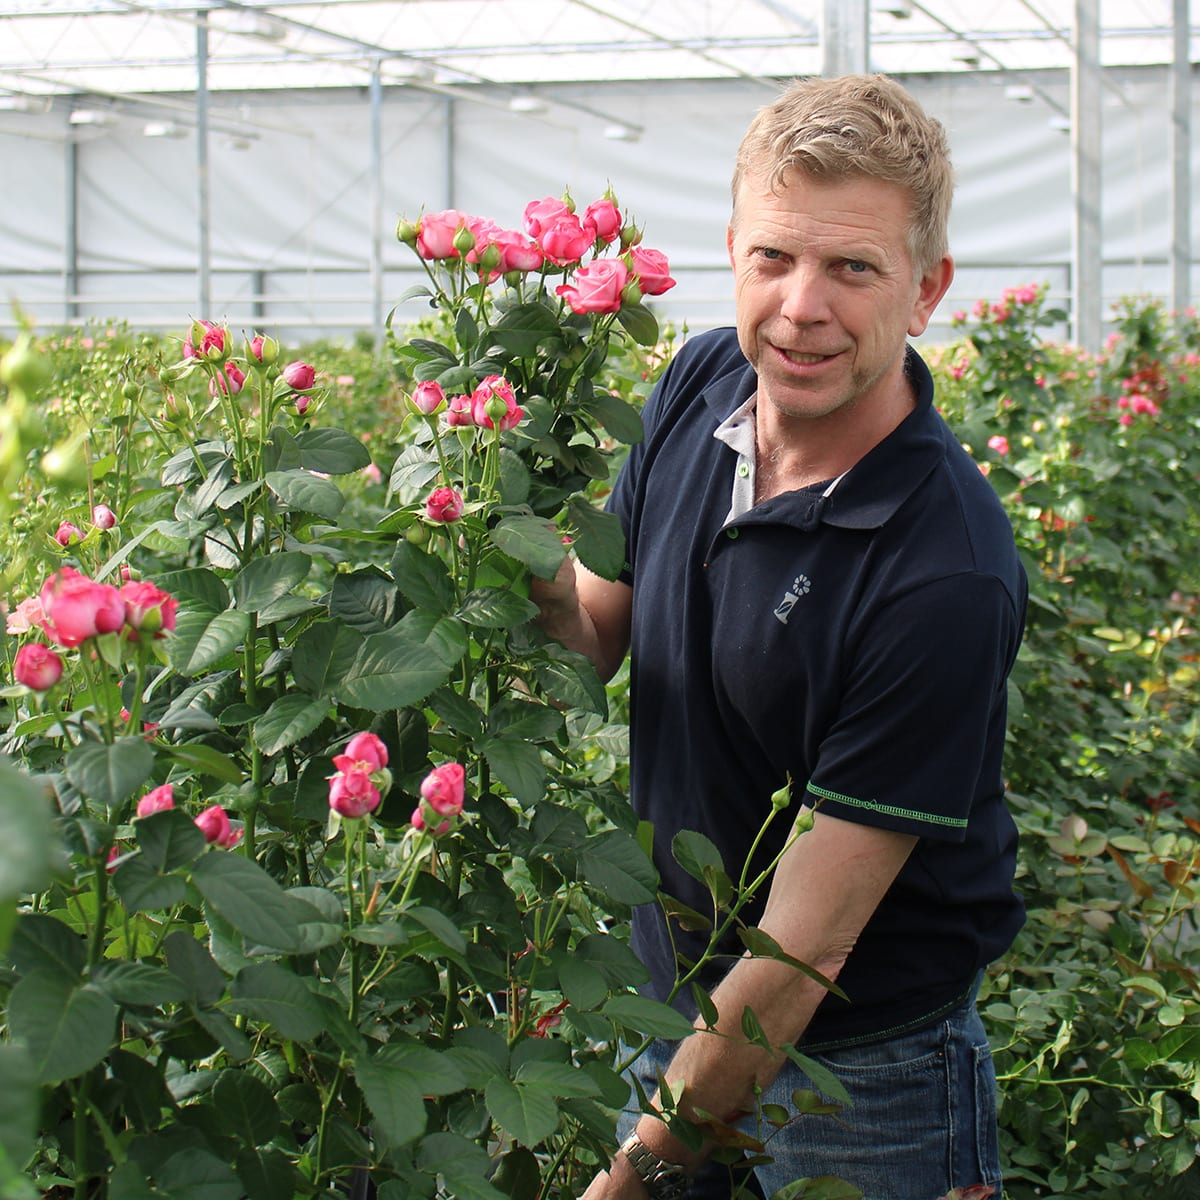 Rooscadeau en rozenkwekerij Van Seters BV. Eigenaar Gertjan van Segers is al ruim 40 jaar erkend rozenkweker.